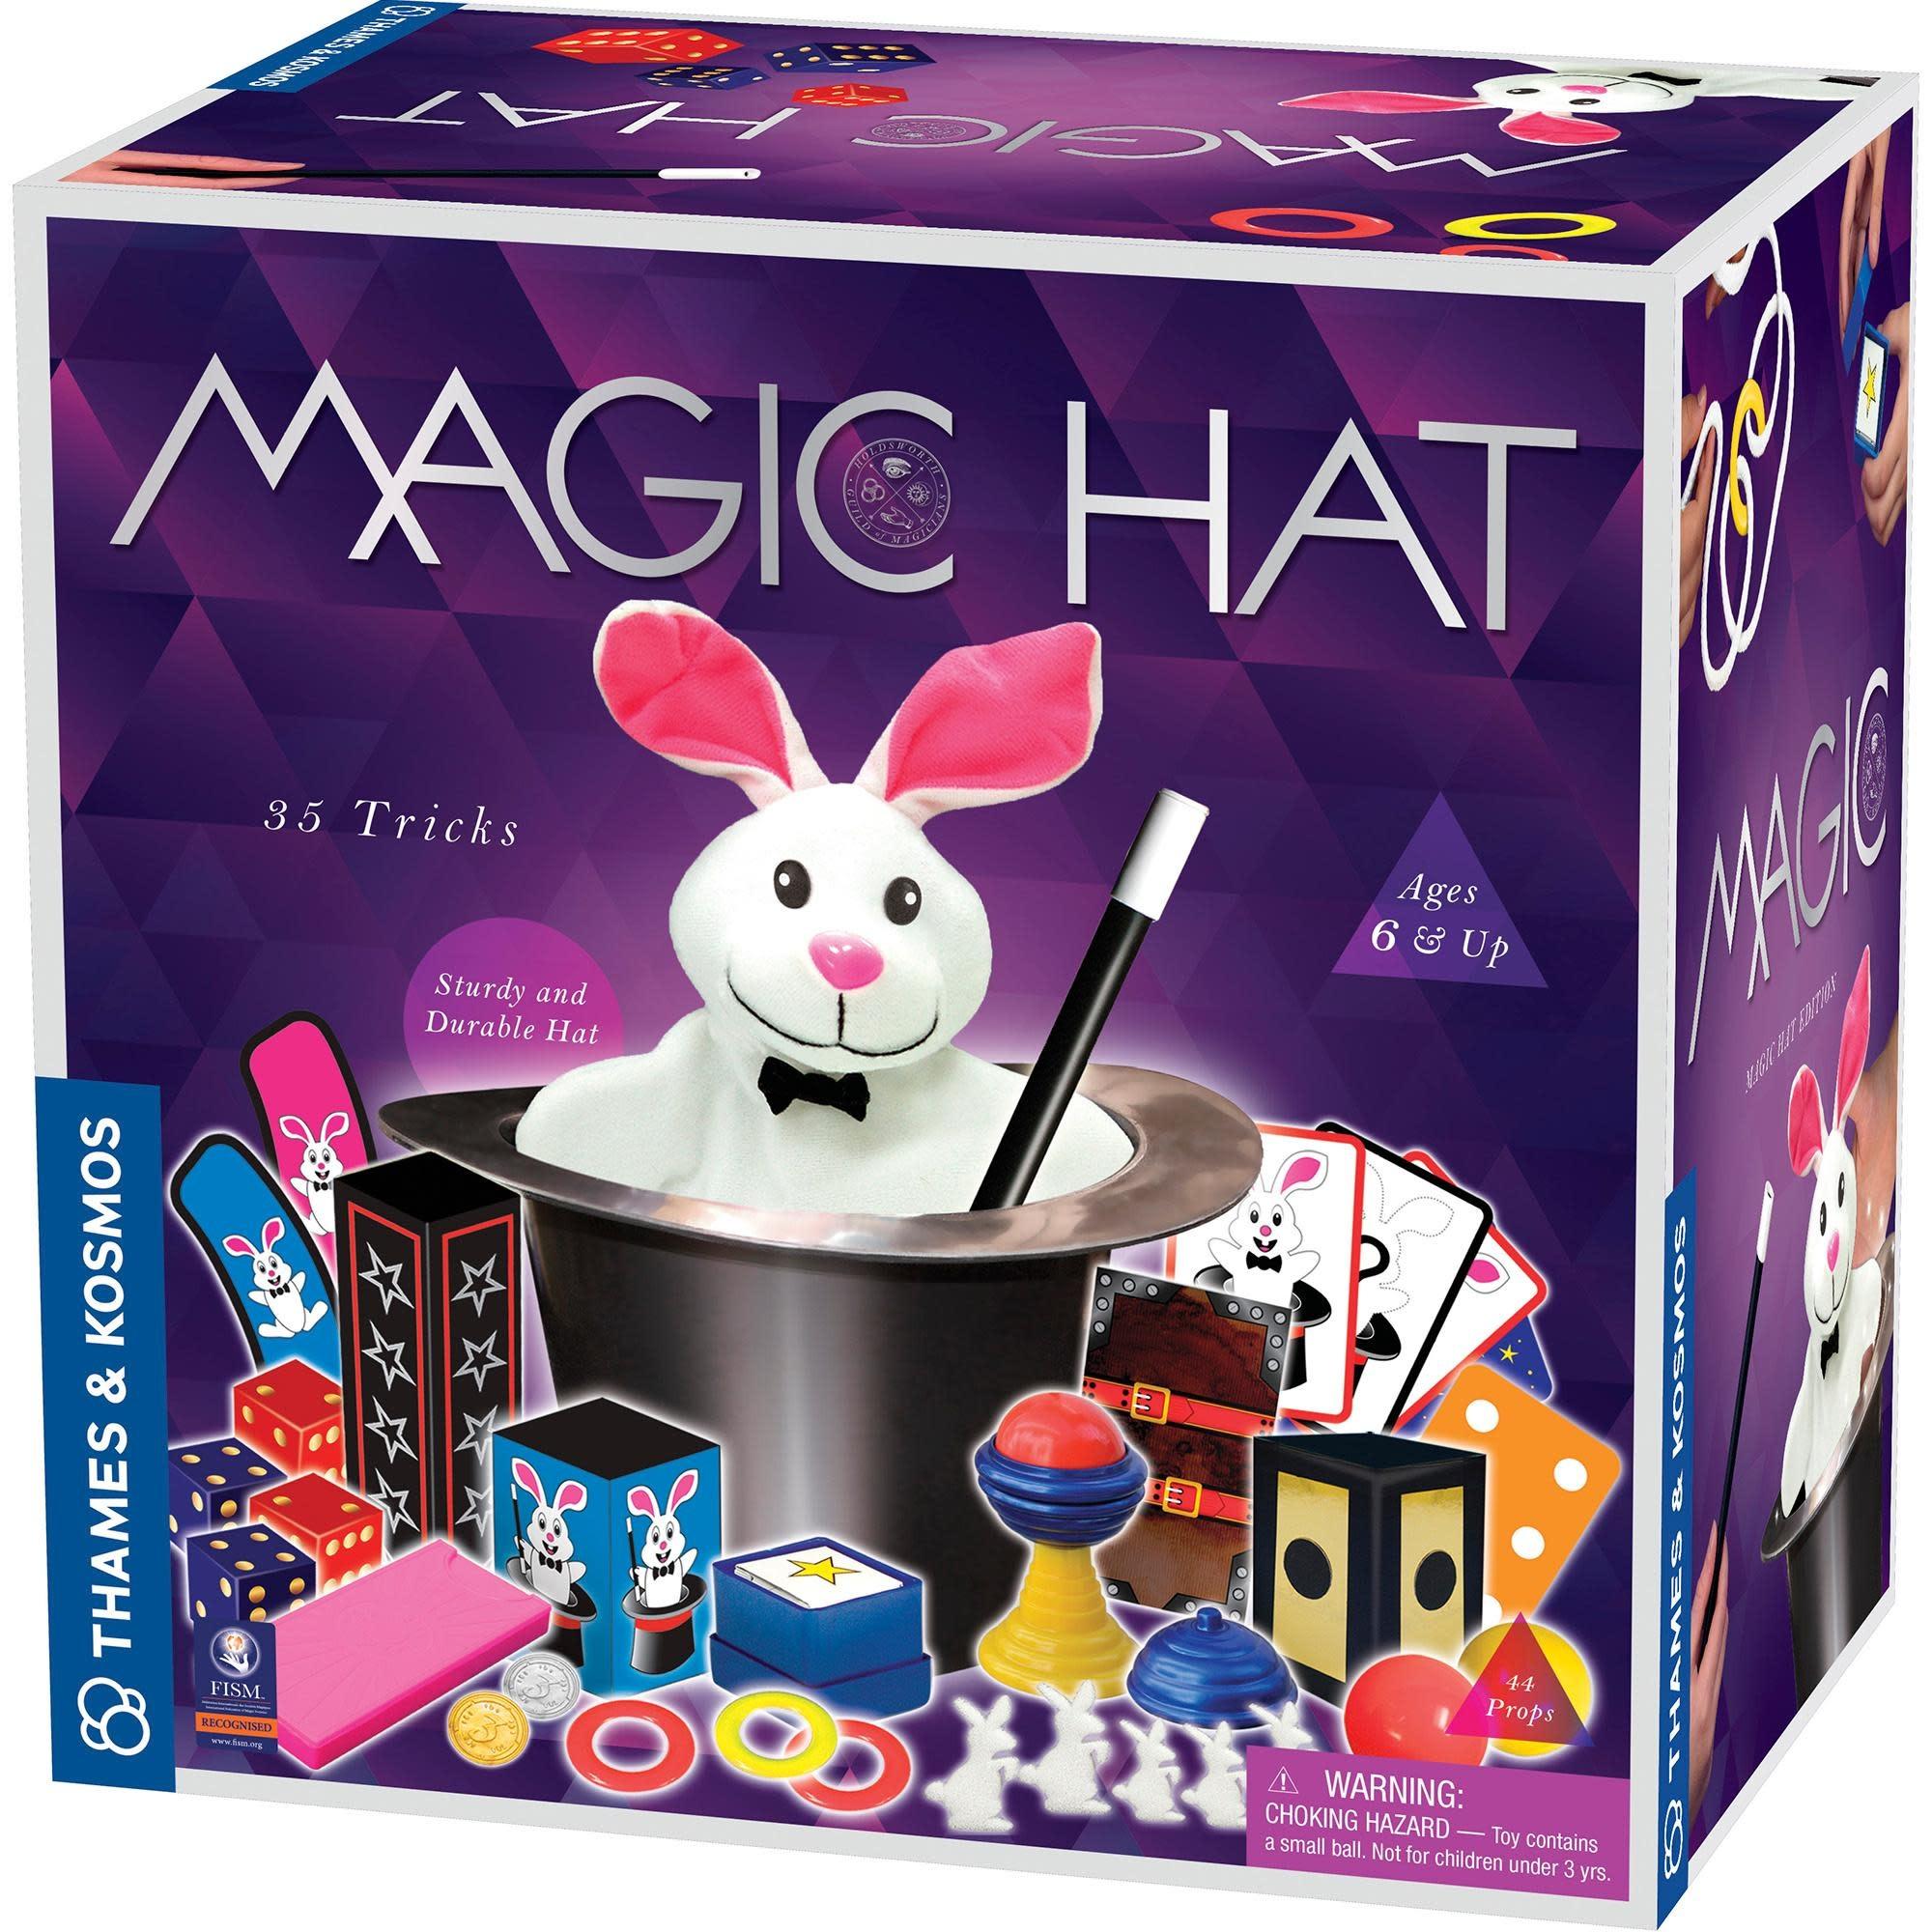 Magic Hat  35 Tricks-1